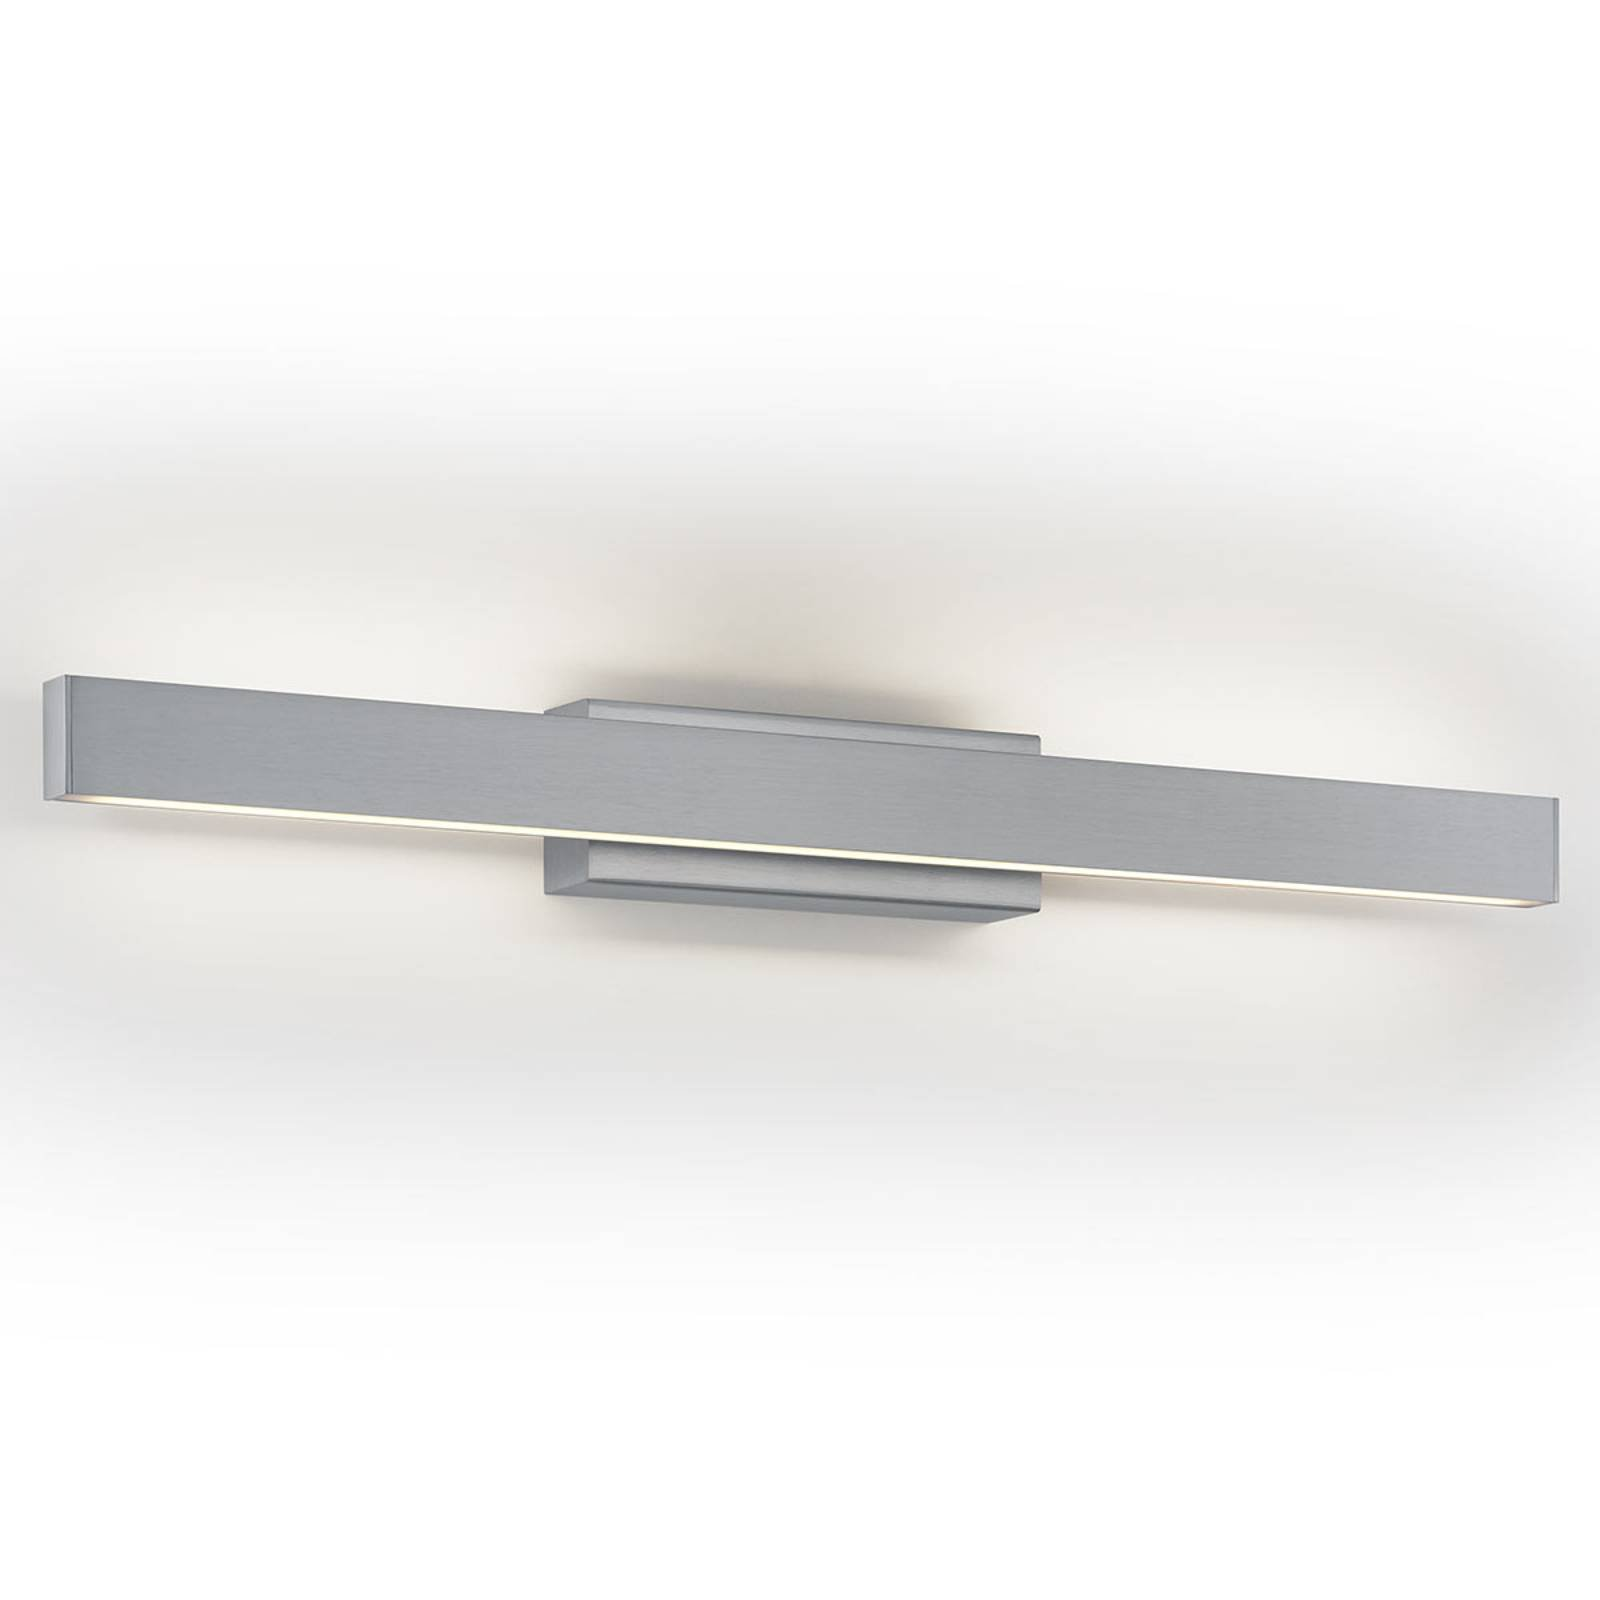 LED-vegglampe Pia, dimbar, matt nikkel